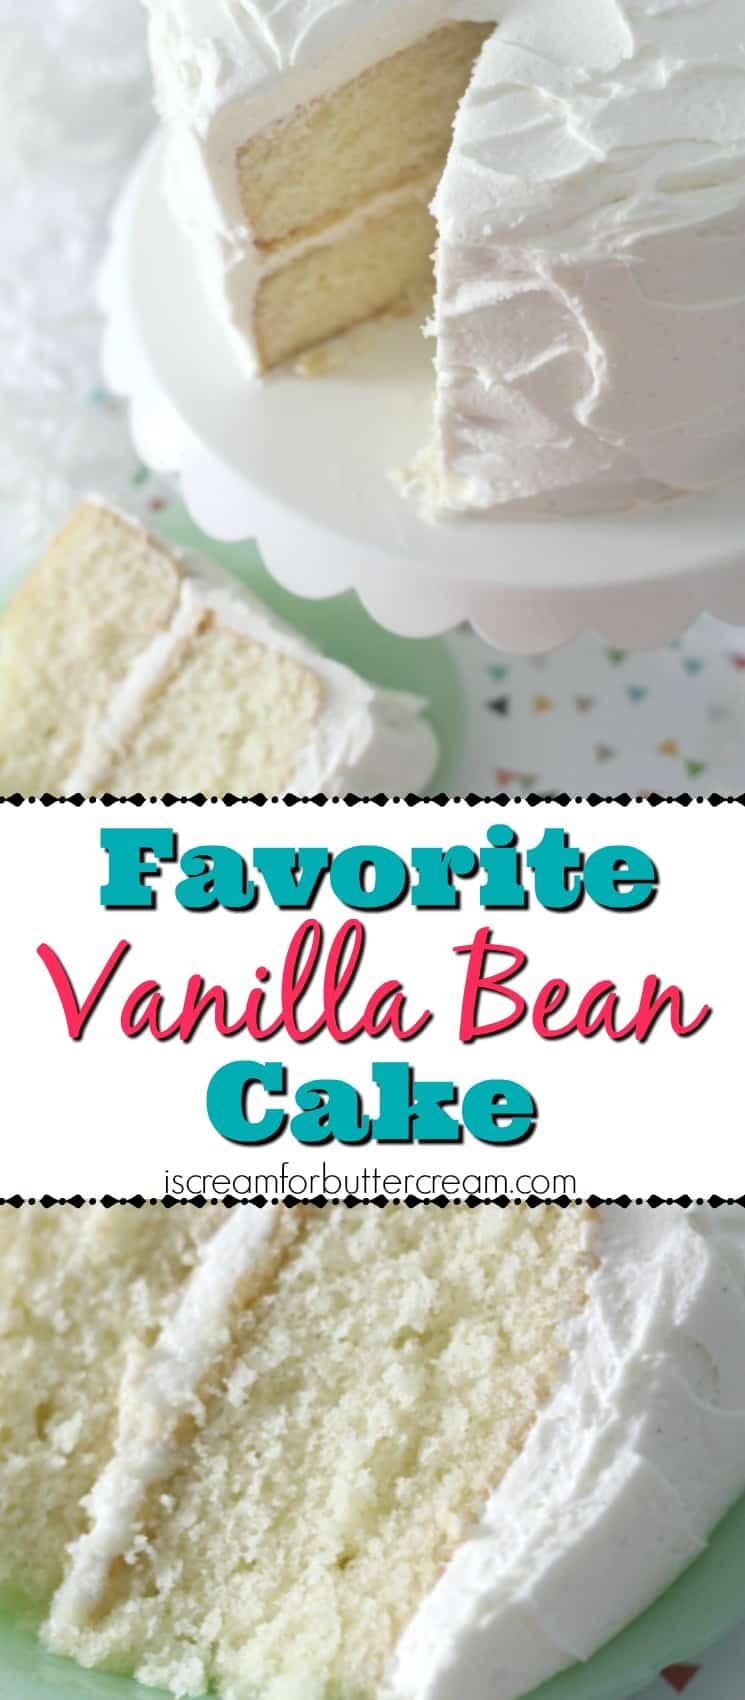 Favorite Vanilla Bean Cake Pinterest Graphic